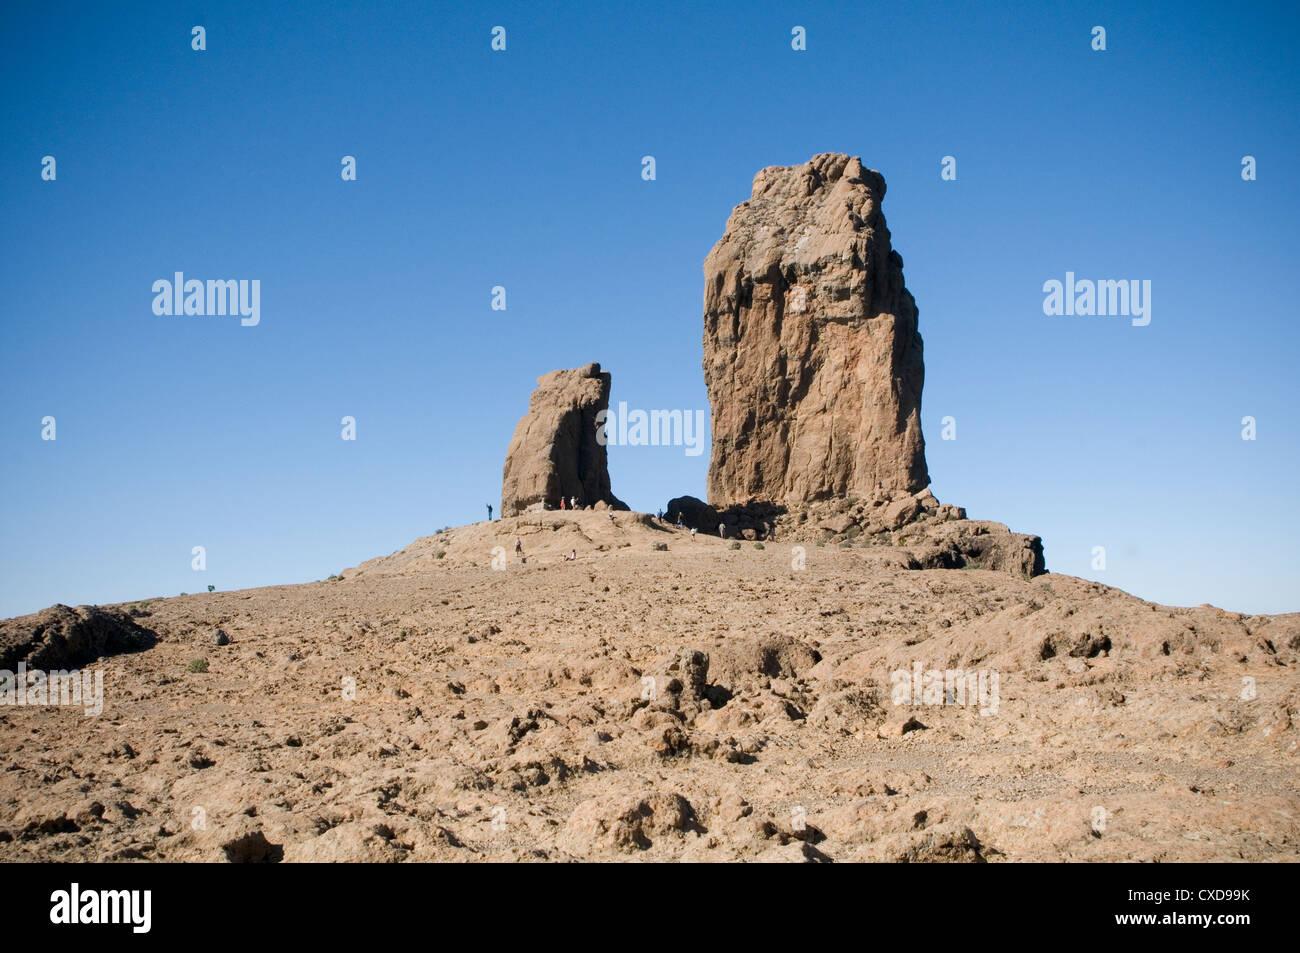 Pico de las Nieves gran canary island canaries islands canaria volcanic highest peak on rock rocks formation formations - Stock Image